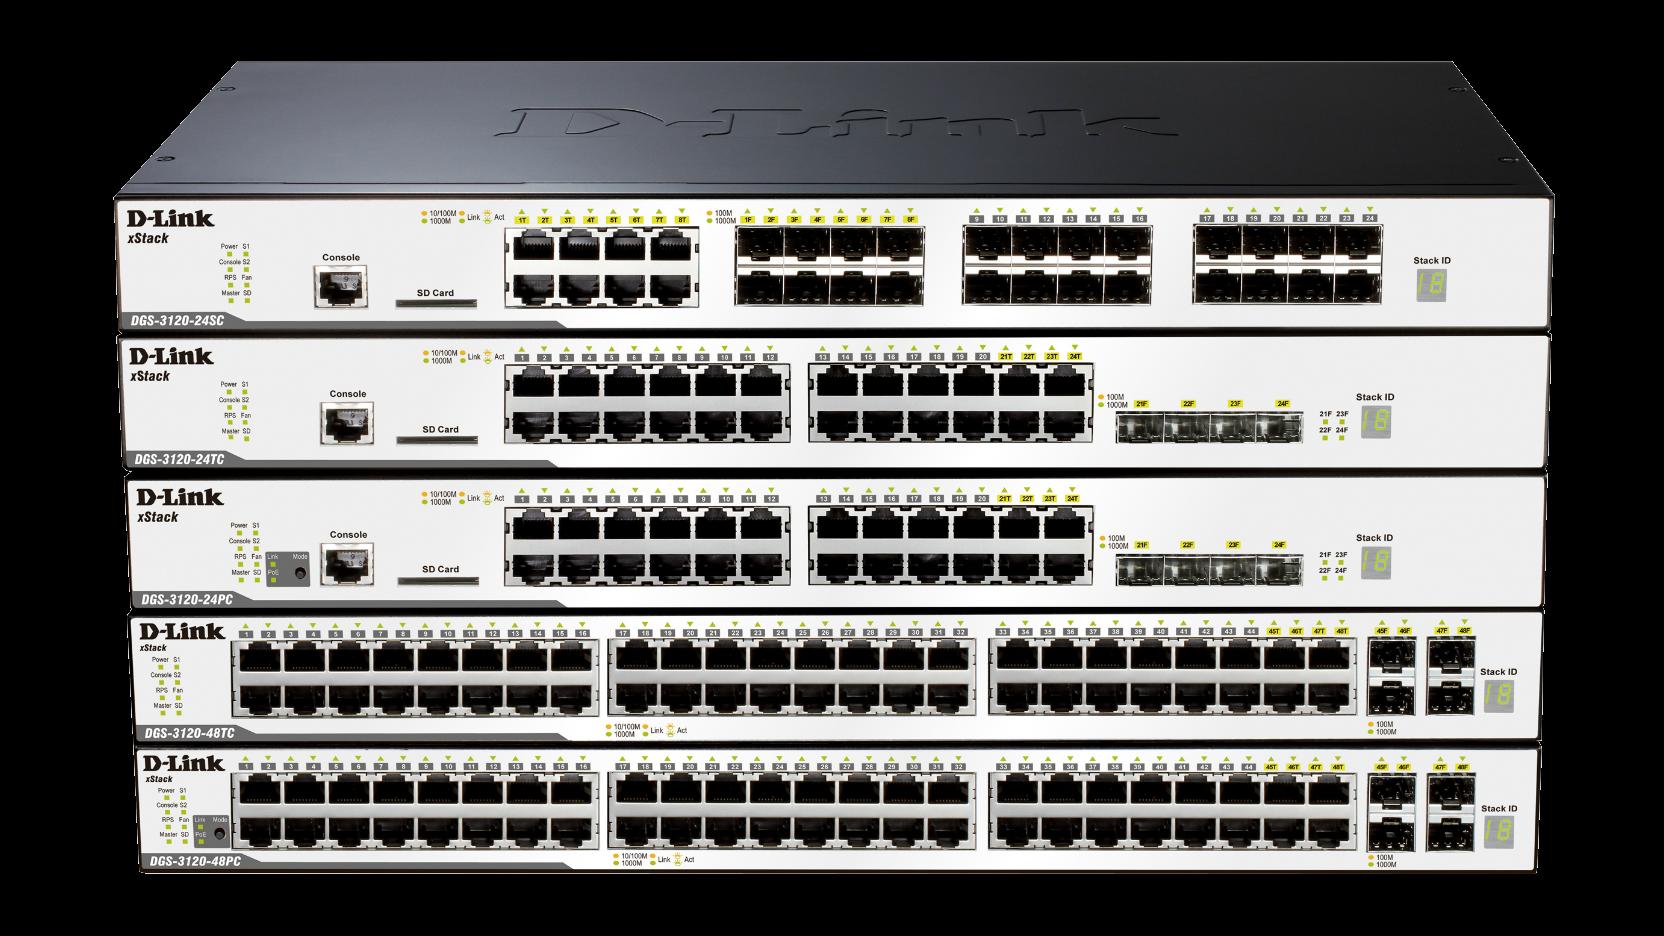 D-LINK DGS-3120-24TC DRIVERS FOR MAC